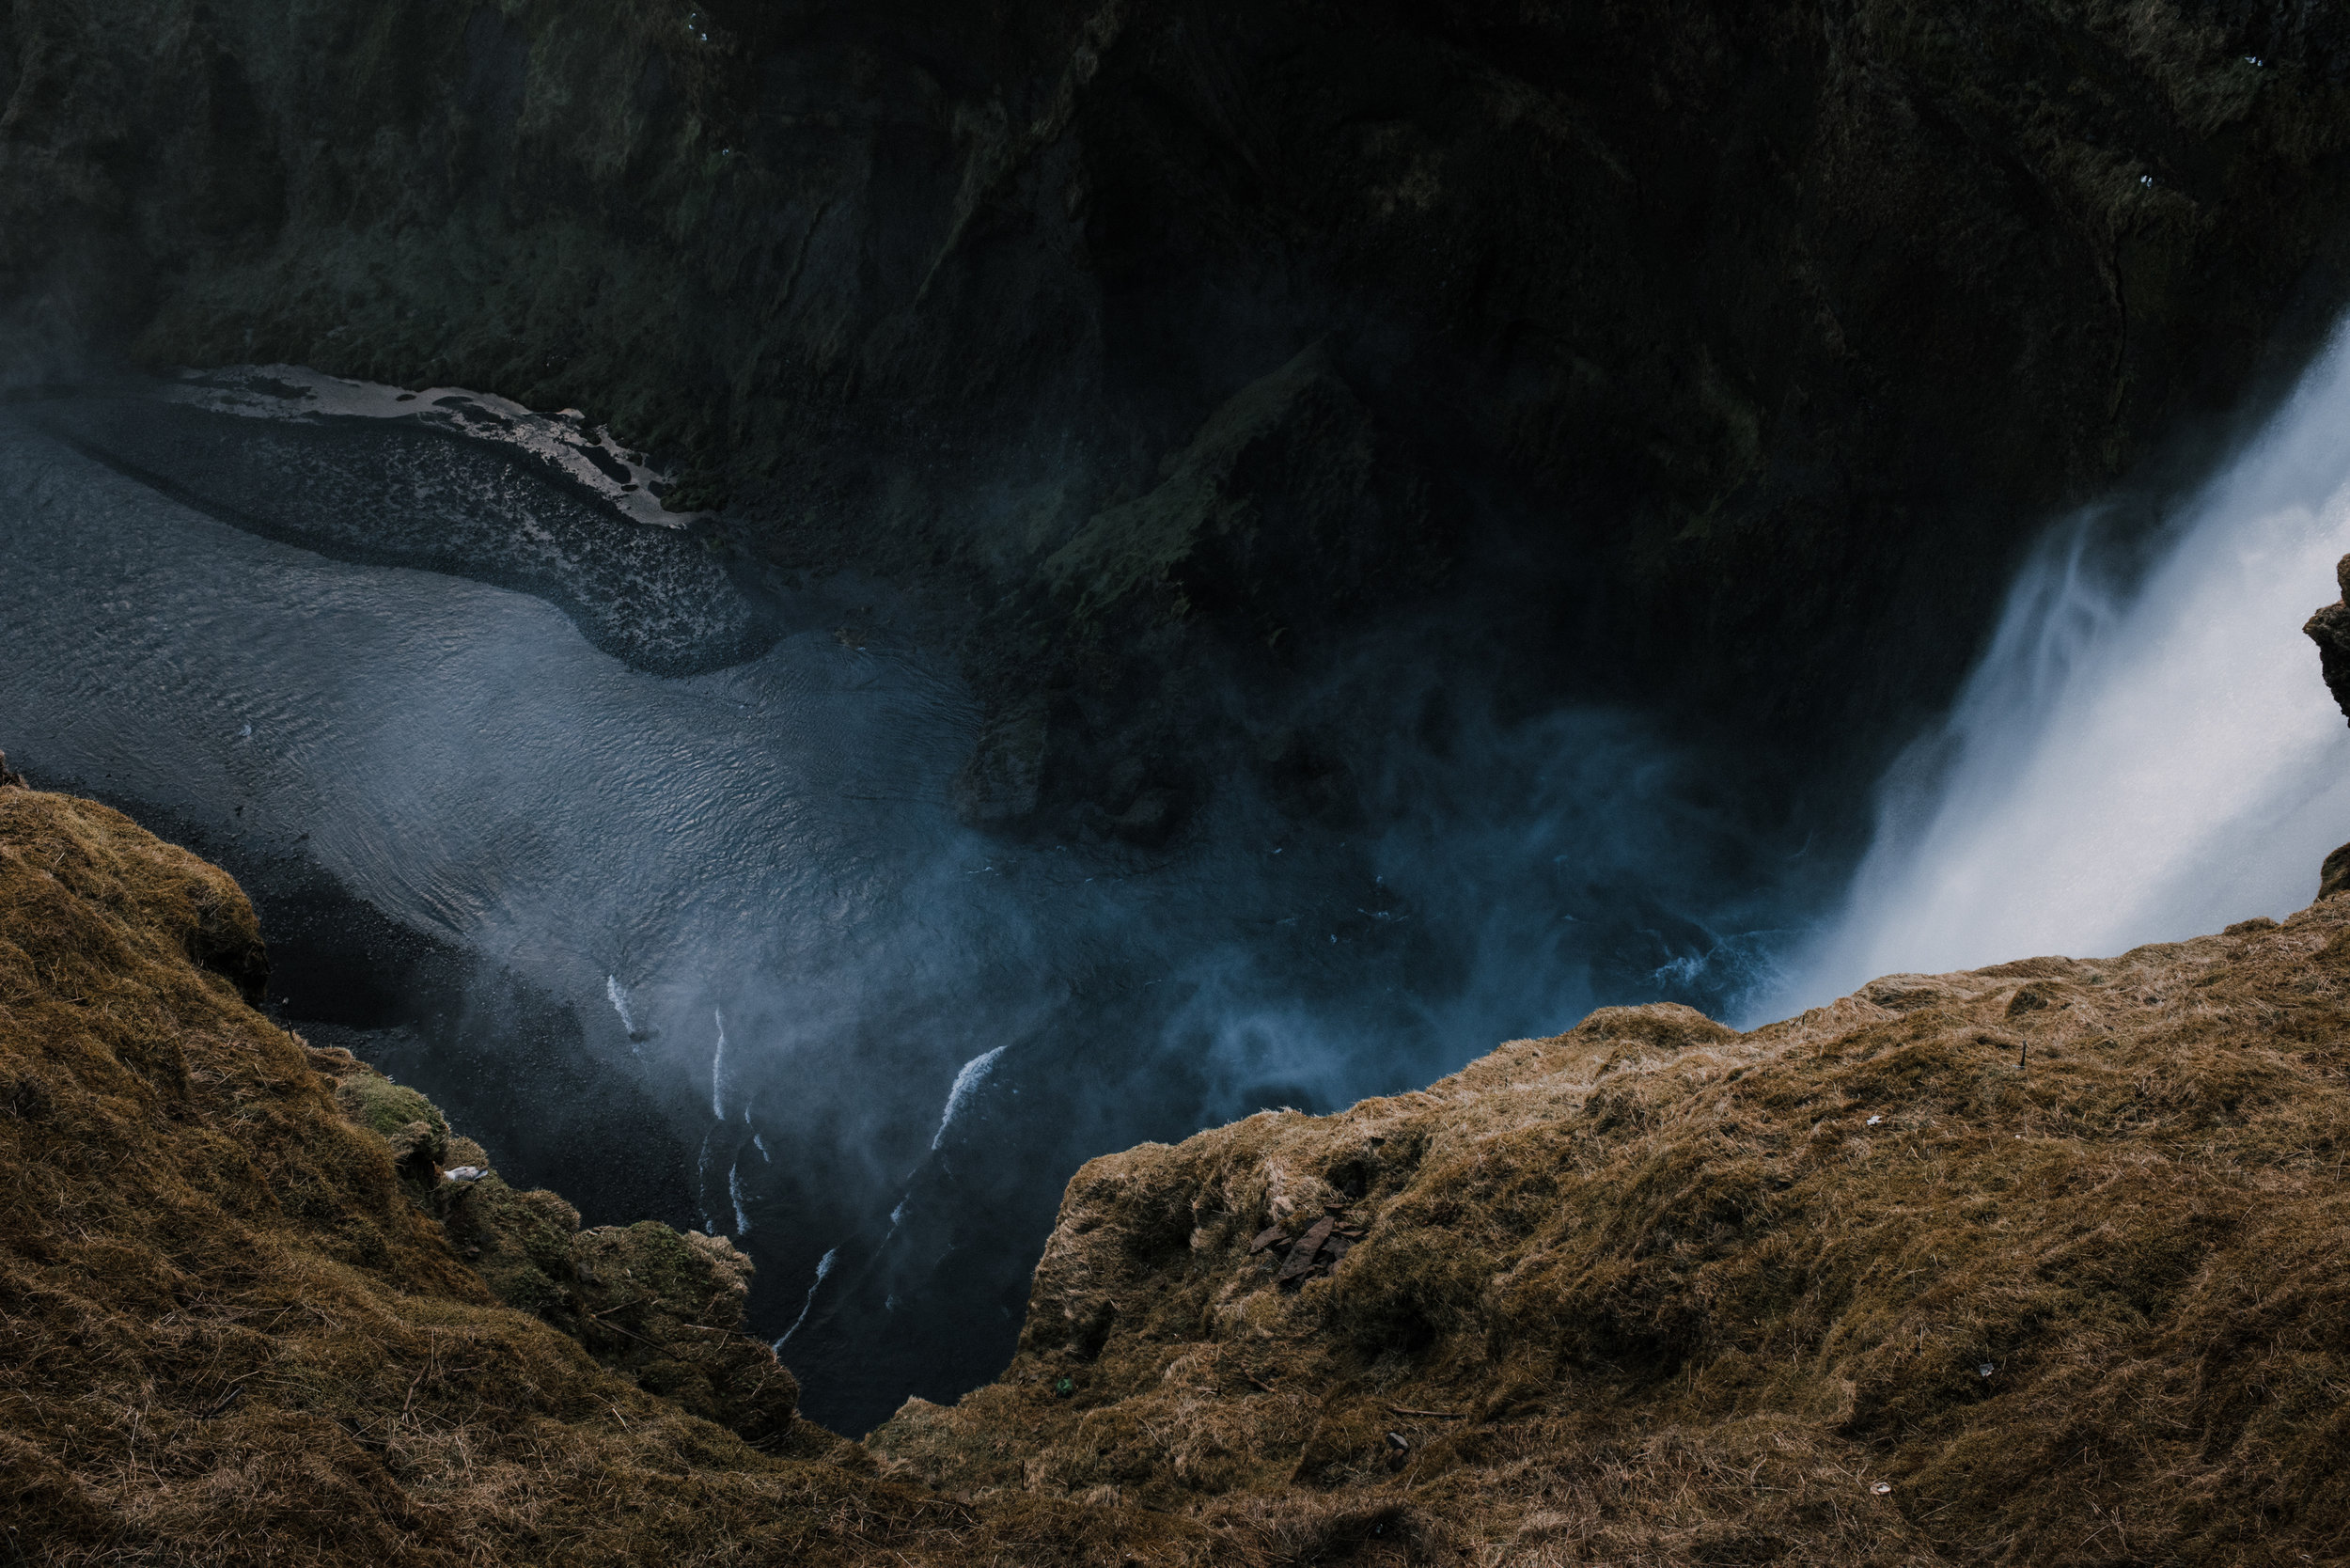 ICELAND_WOMAN_PHOTOGRAPHER_TARASHUPE_OUTDOOR_PHOTOGRAPHY_045.jpg